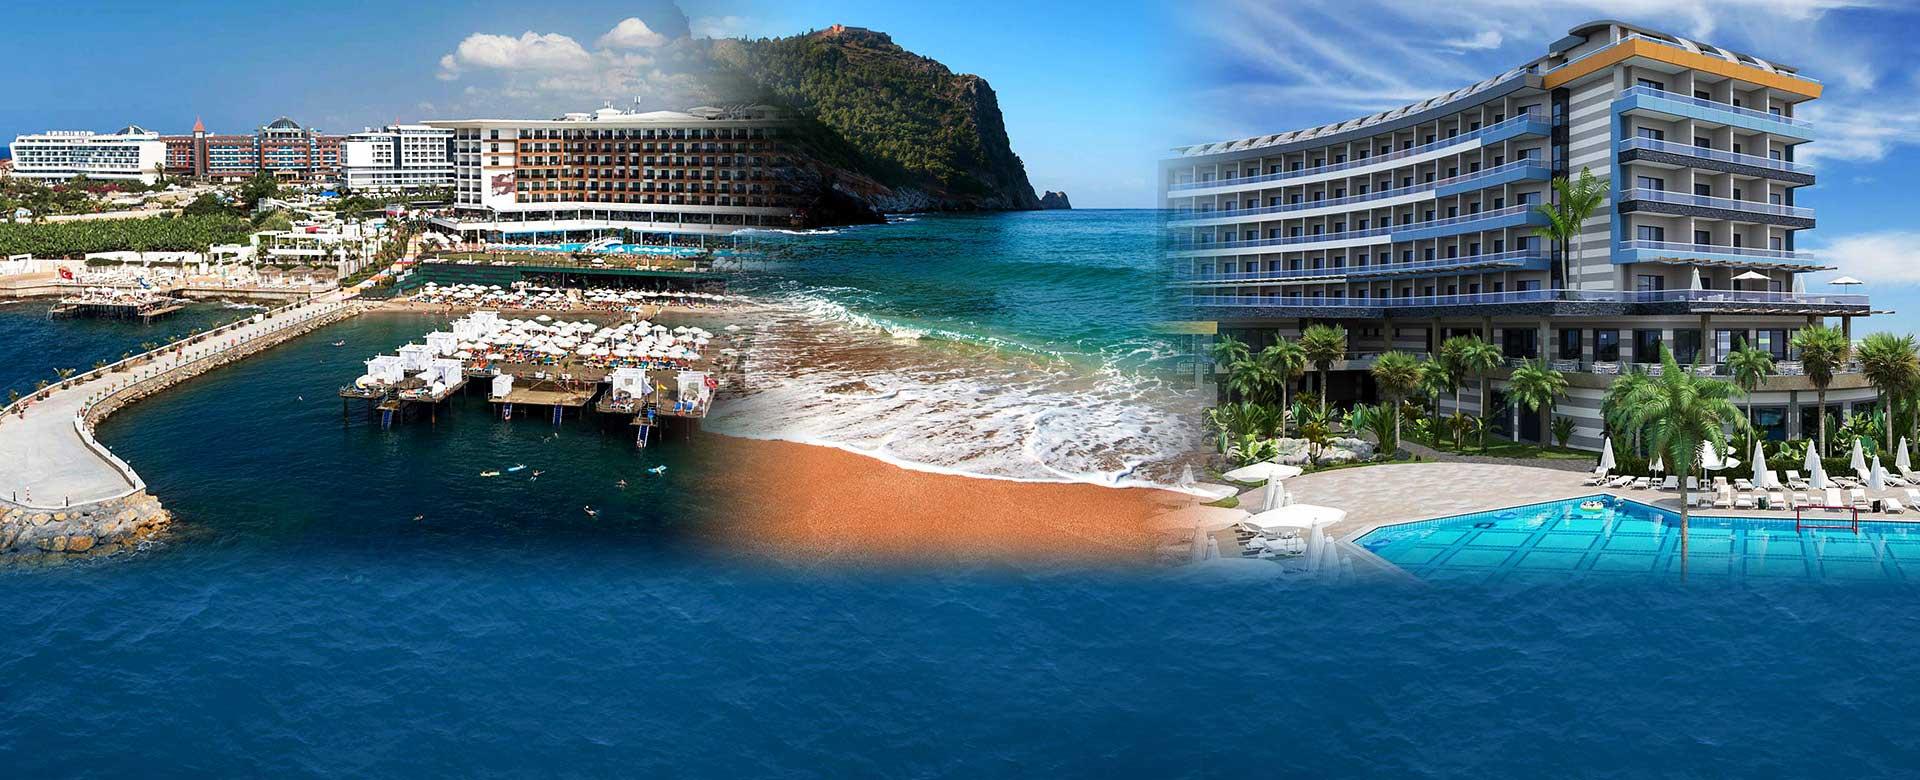 Alanja hoteli za leto 2021. u Turskoj, first i last minute popustima i specijalnim ponudama, avio prevoz direktnim čarter letom. Prelepi hoteli na Kleopatrinoj plaži.